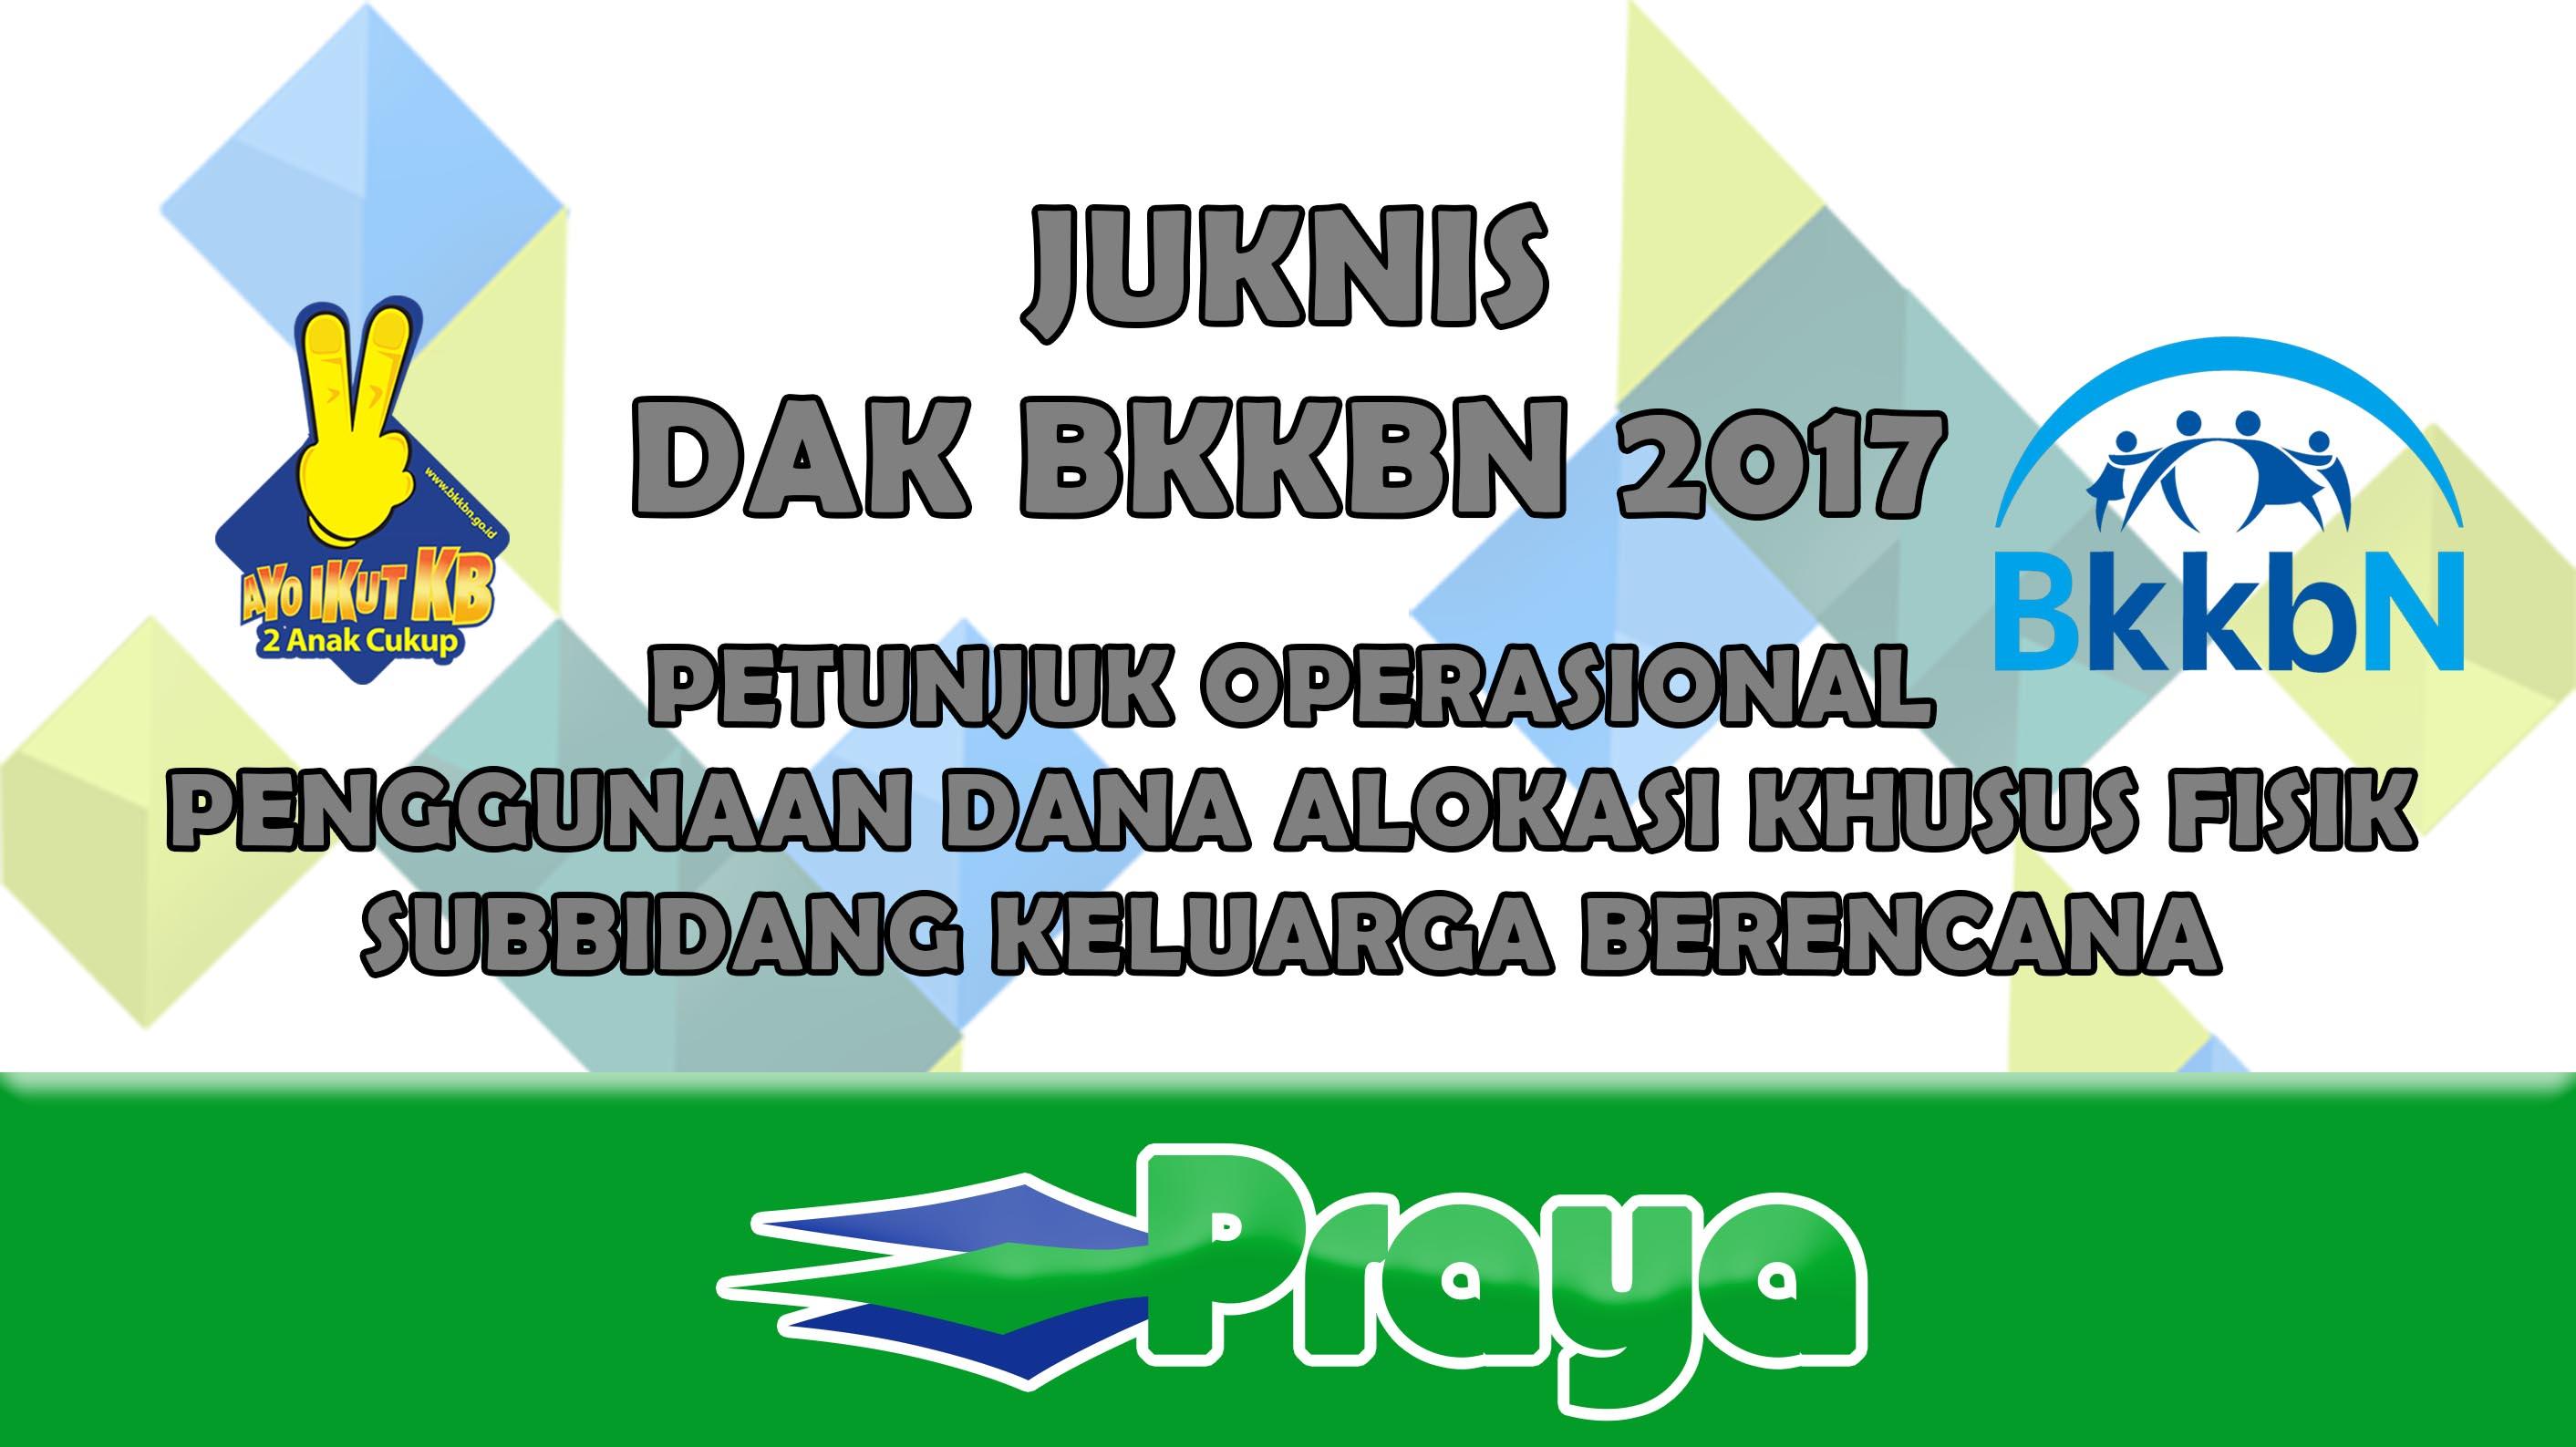 JUKNIS DAK BKKBN 2017